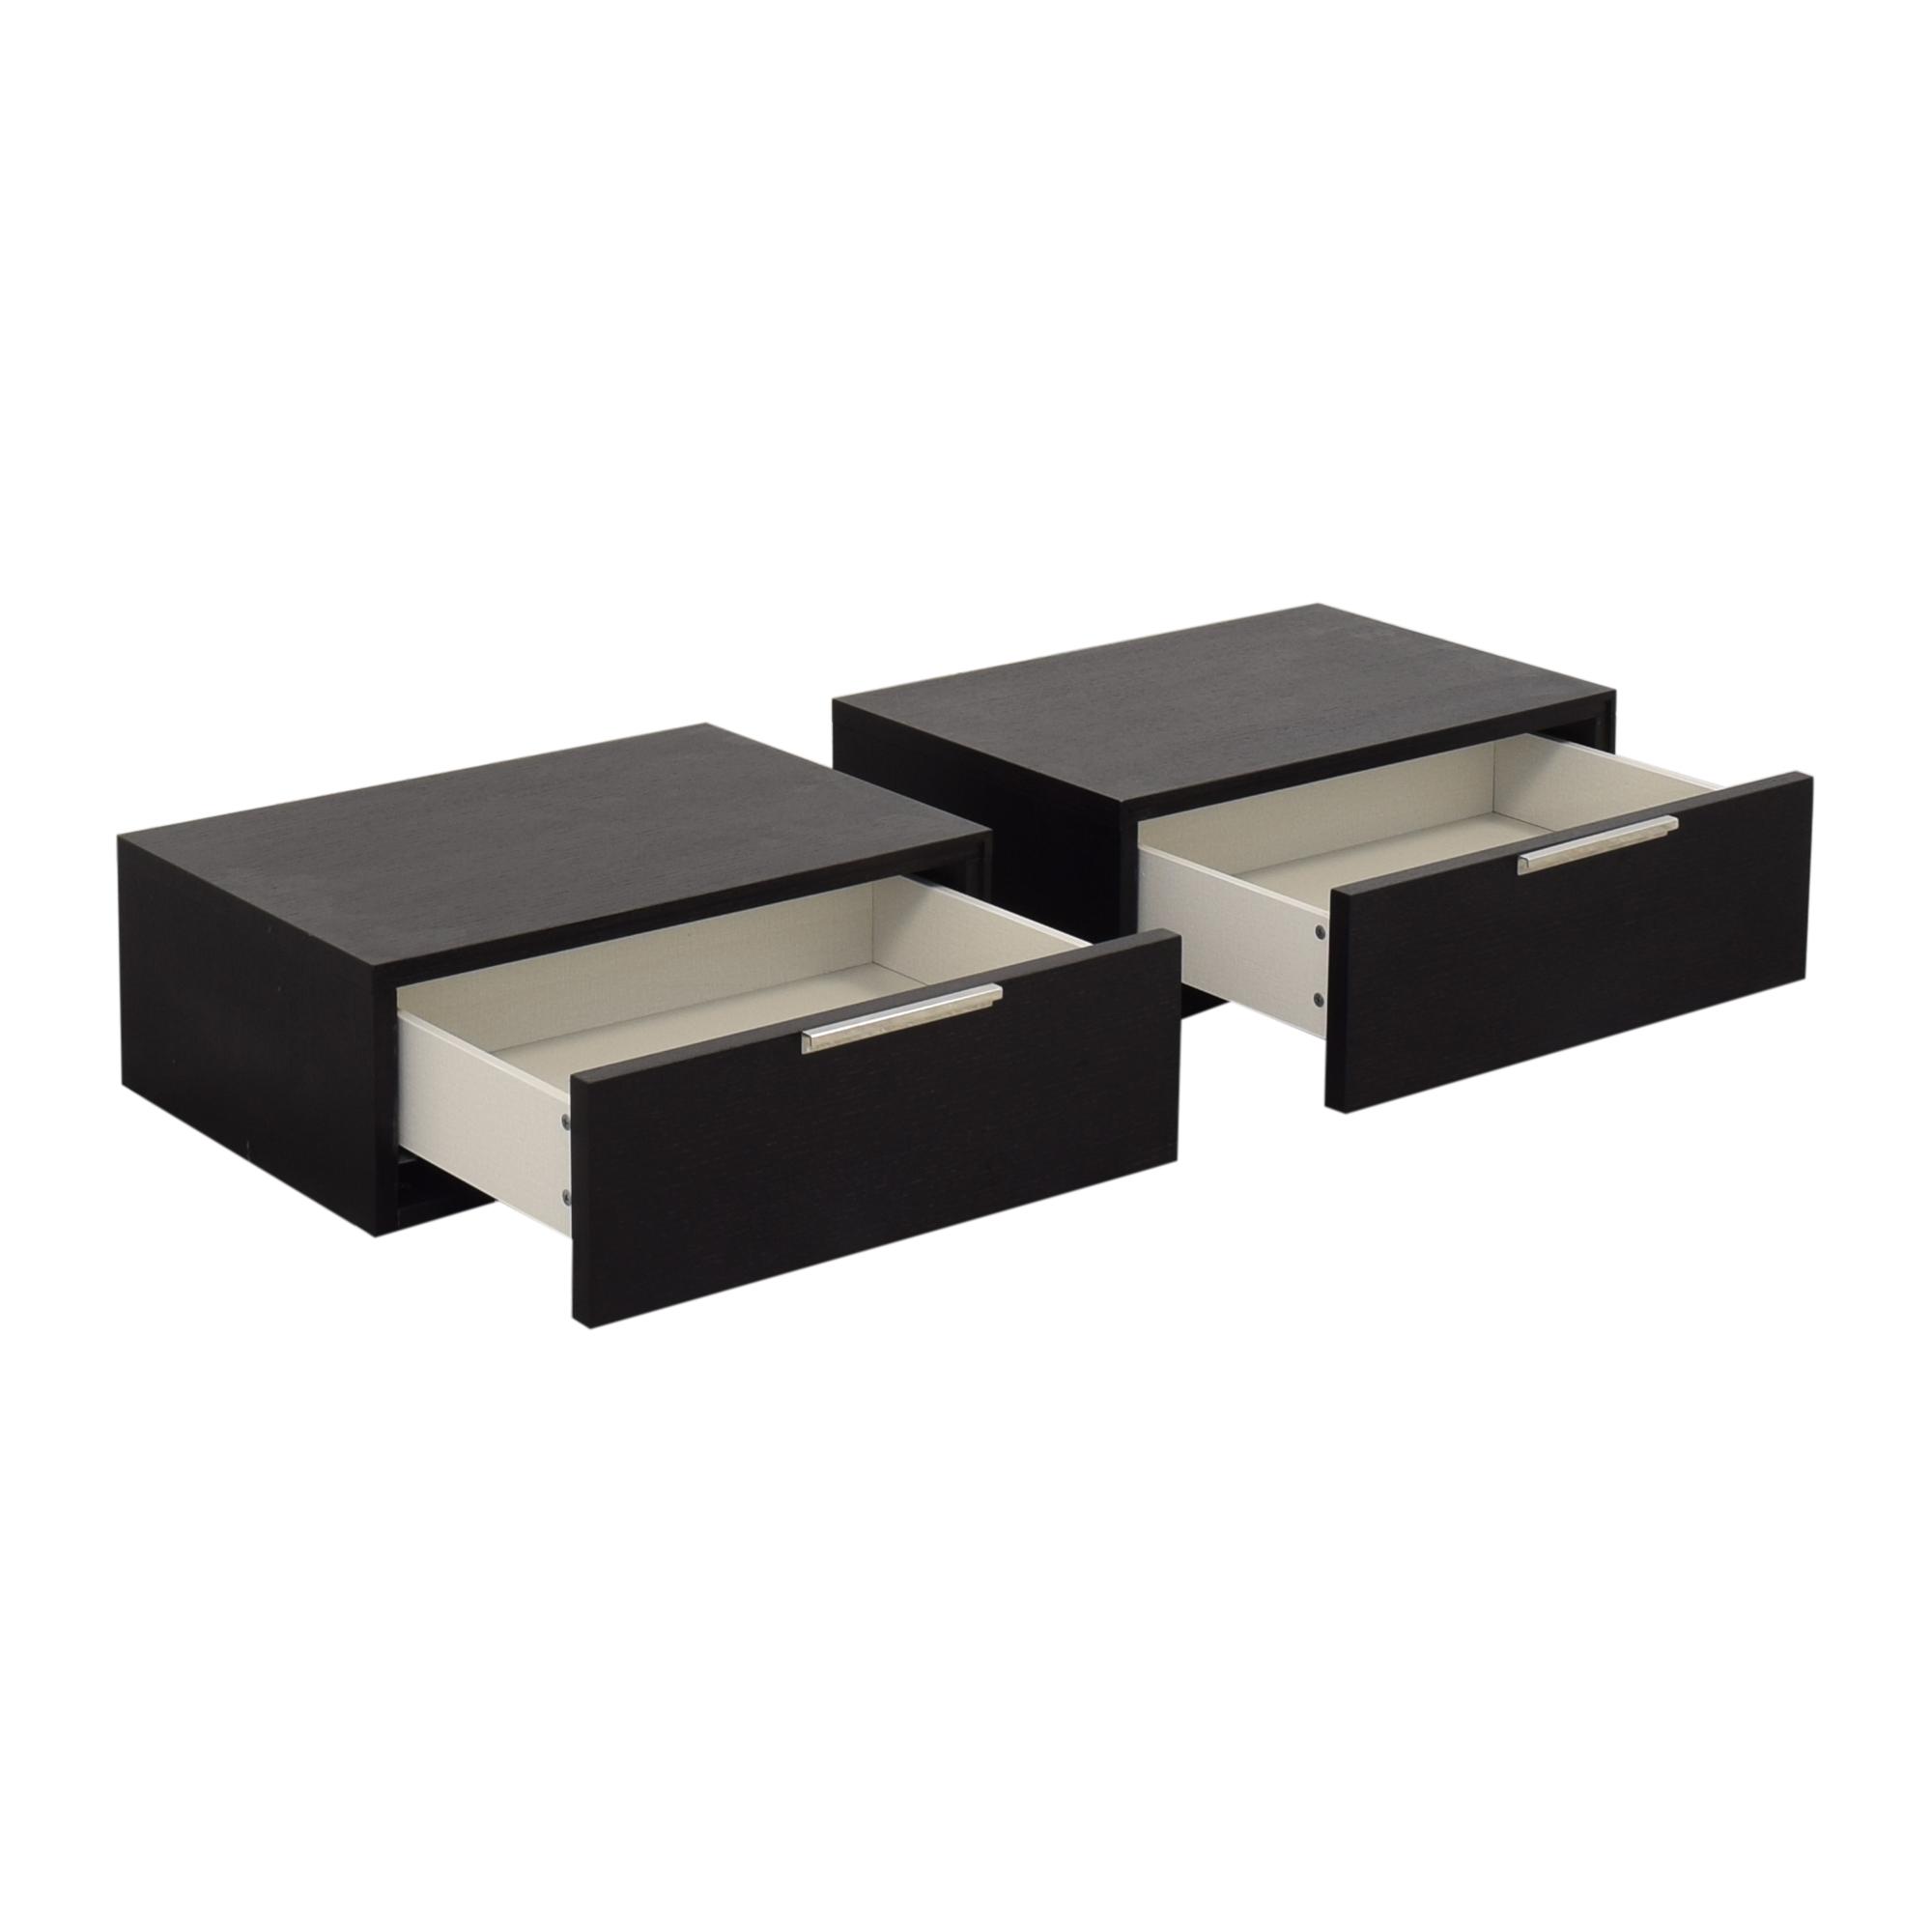 Modloft Modloft Thomspon Two-Drawer Nightstands price